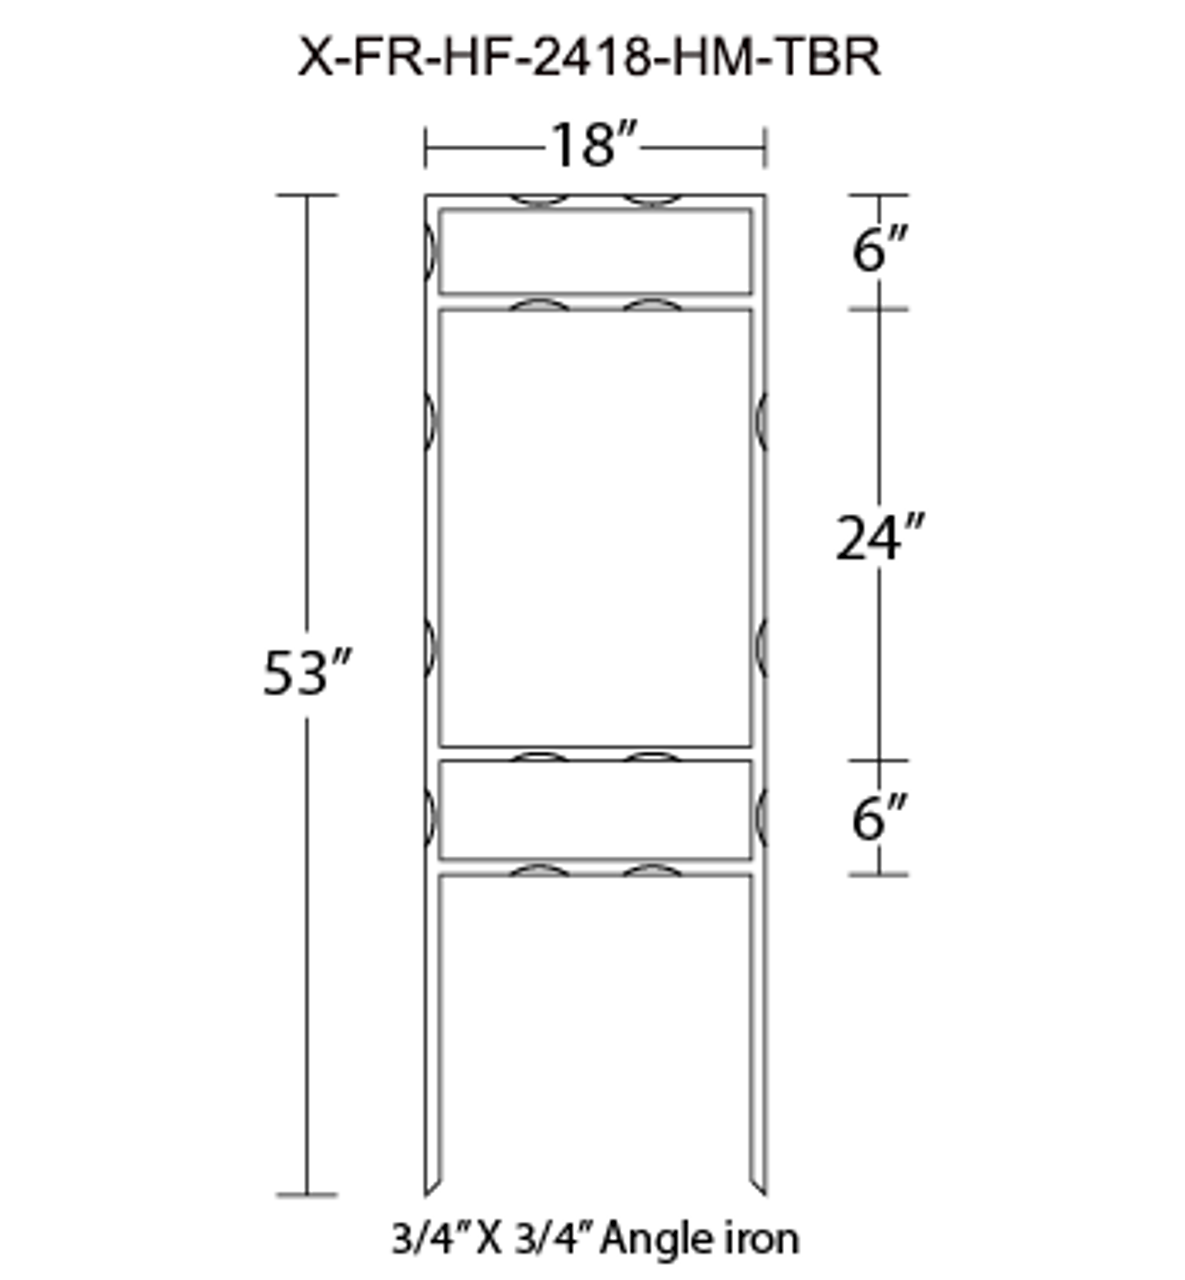 X-FR-HF-2418-HM-TBR